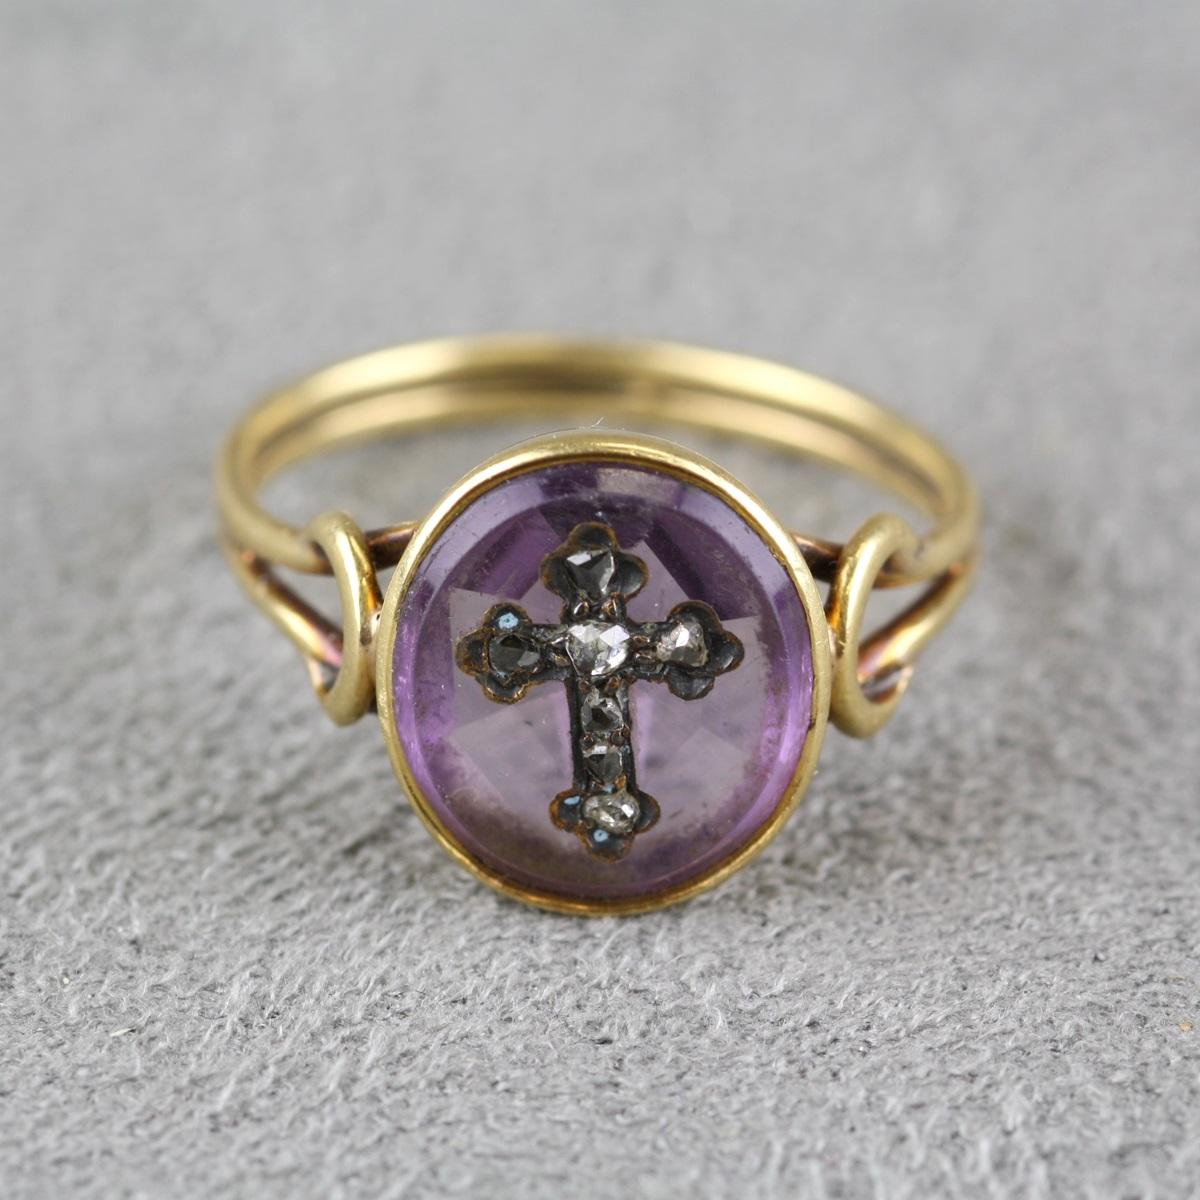 Antique Amethyst And Diamond Intaglio Ring